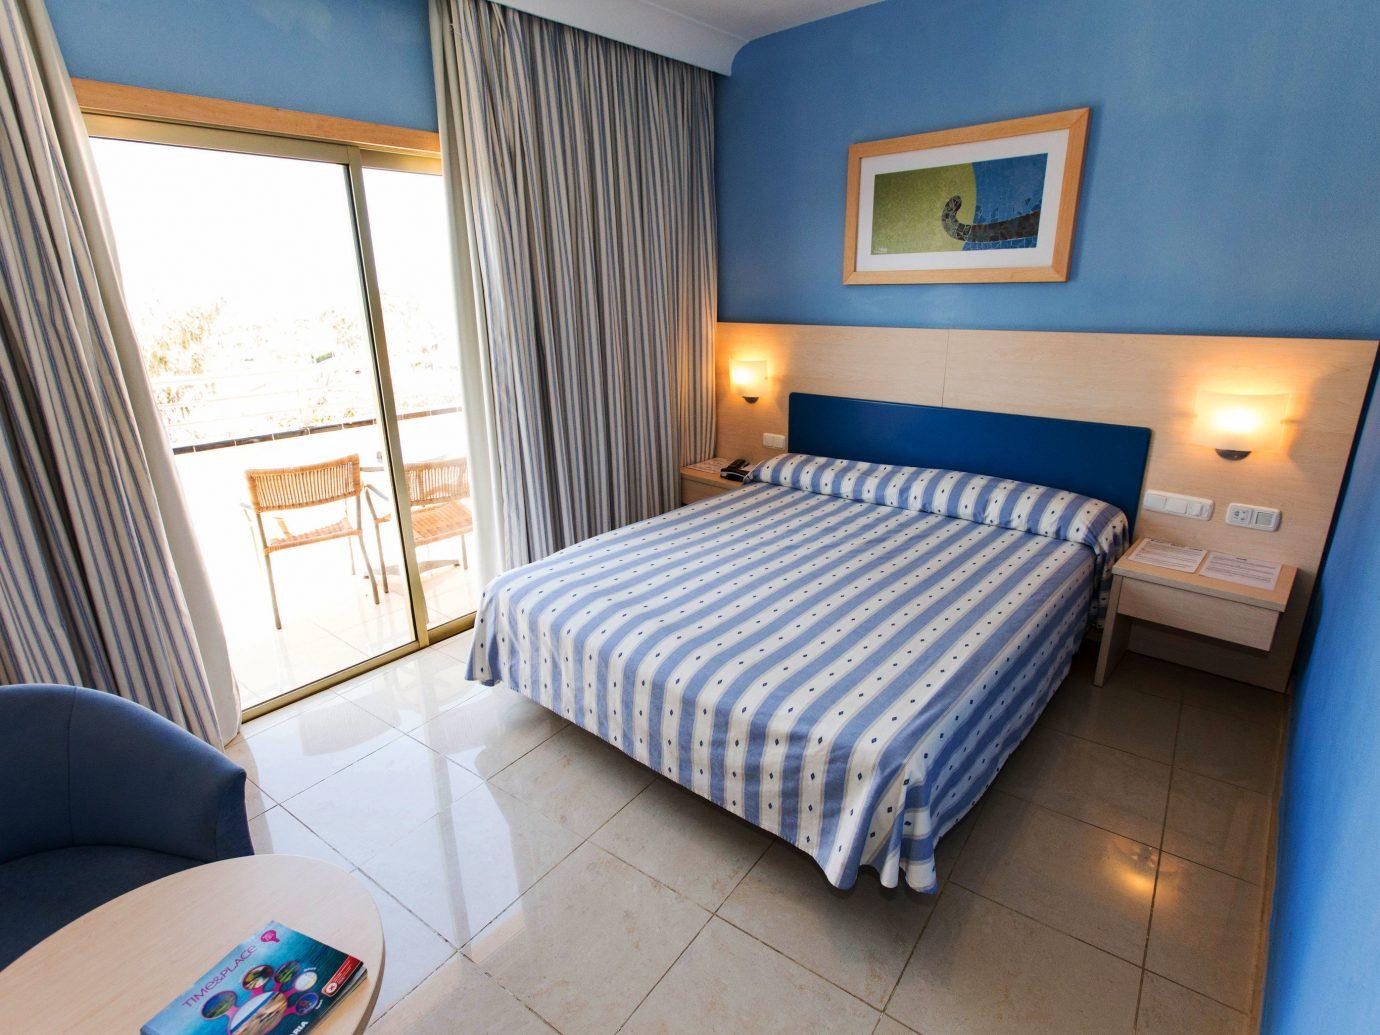 All-Inclusive Resorts Hotels indoor floor room property Bedroom Suite cottage real estate estate apartment Villa furniture